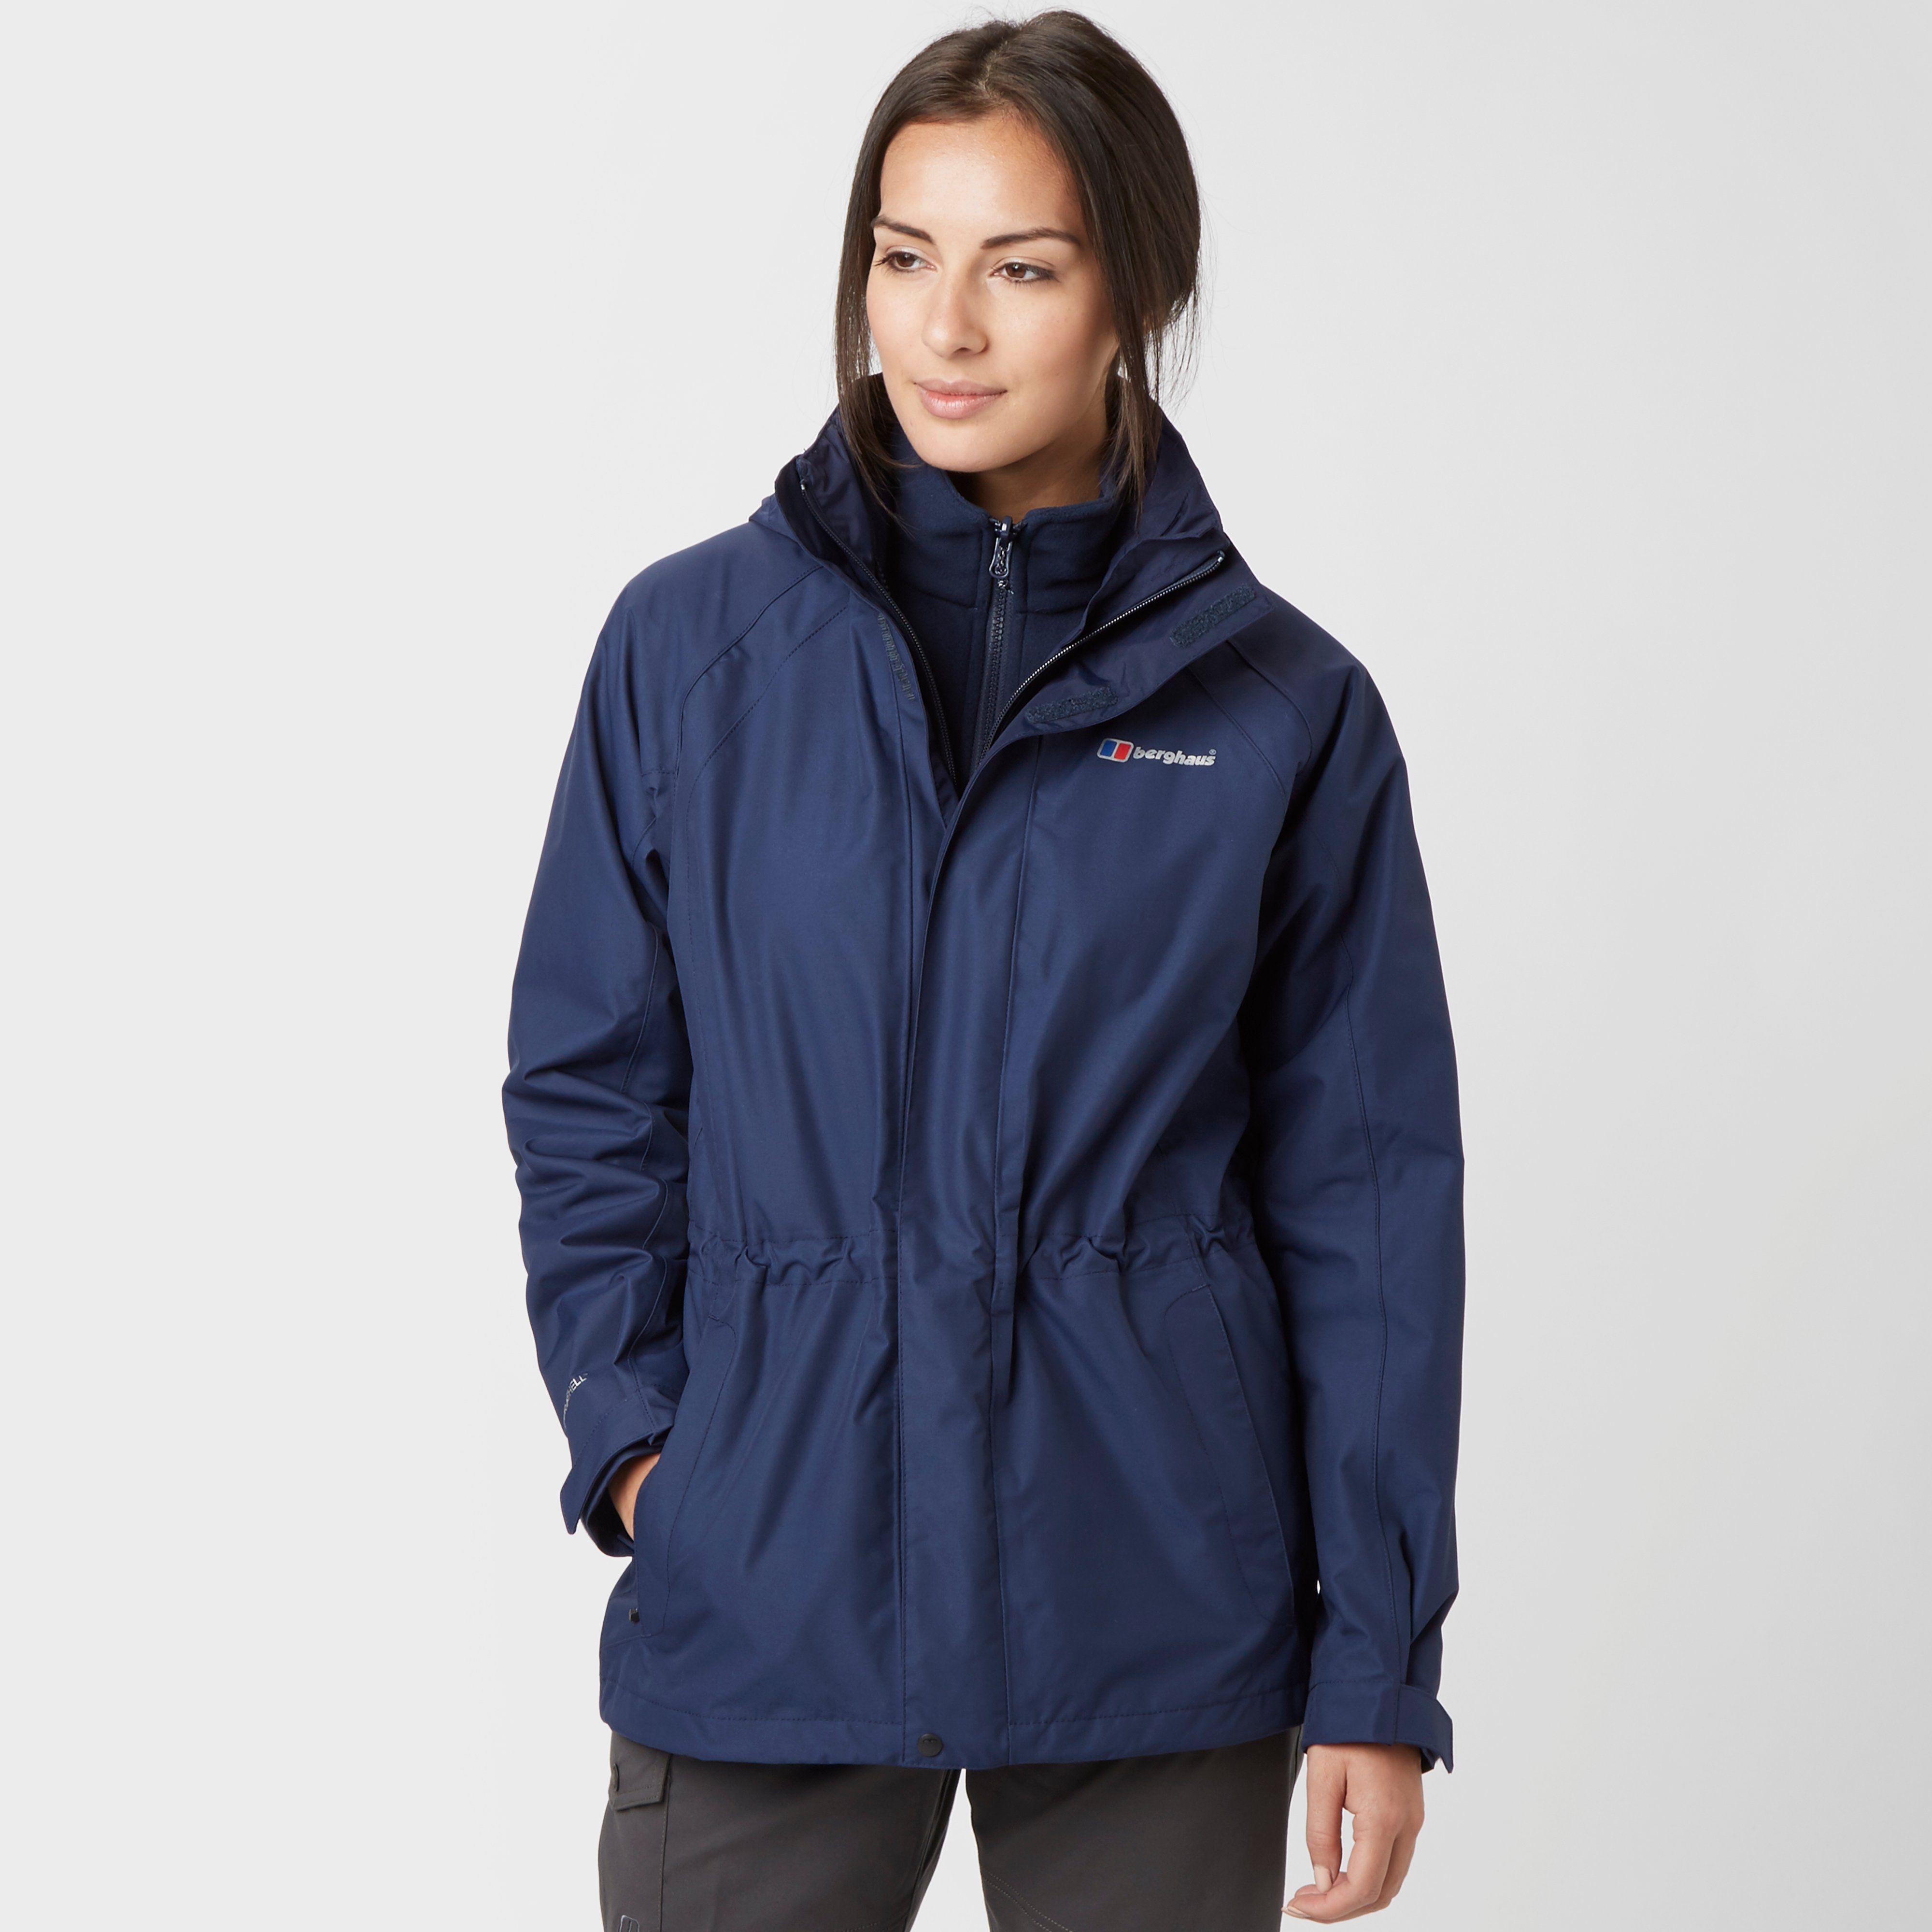 BERGHAUS Women's Rosgill 3 in 1 Waterproof Jacket